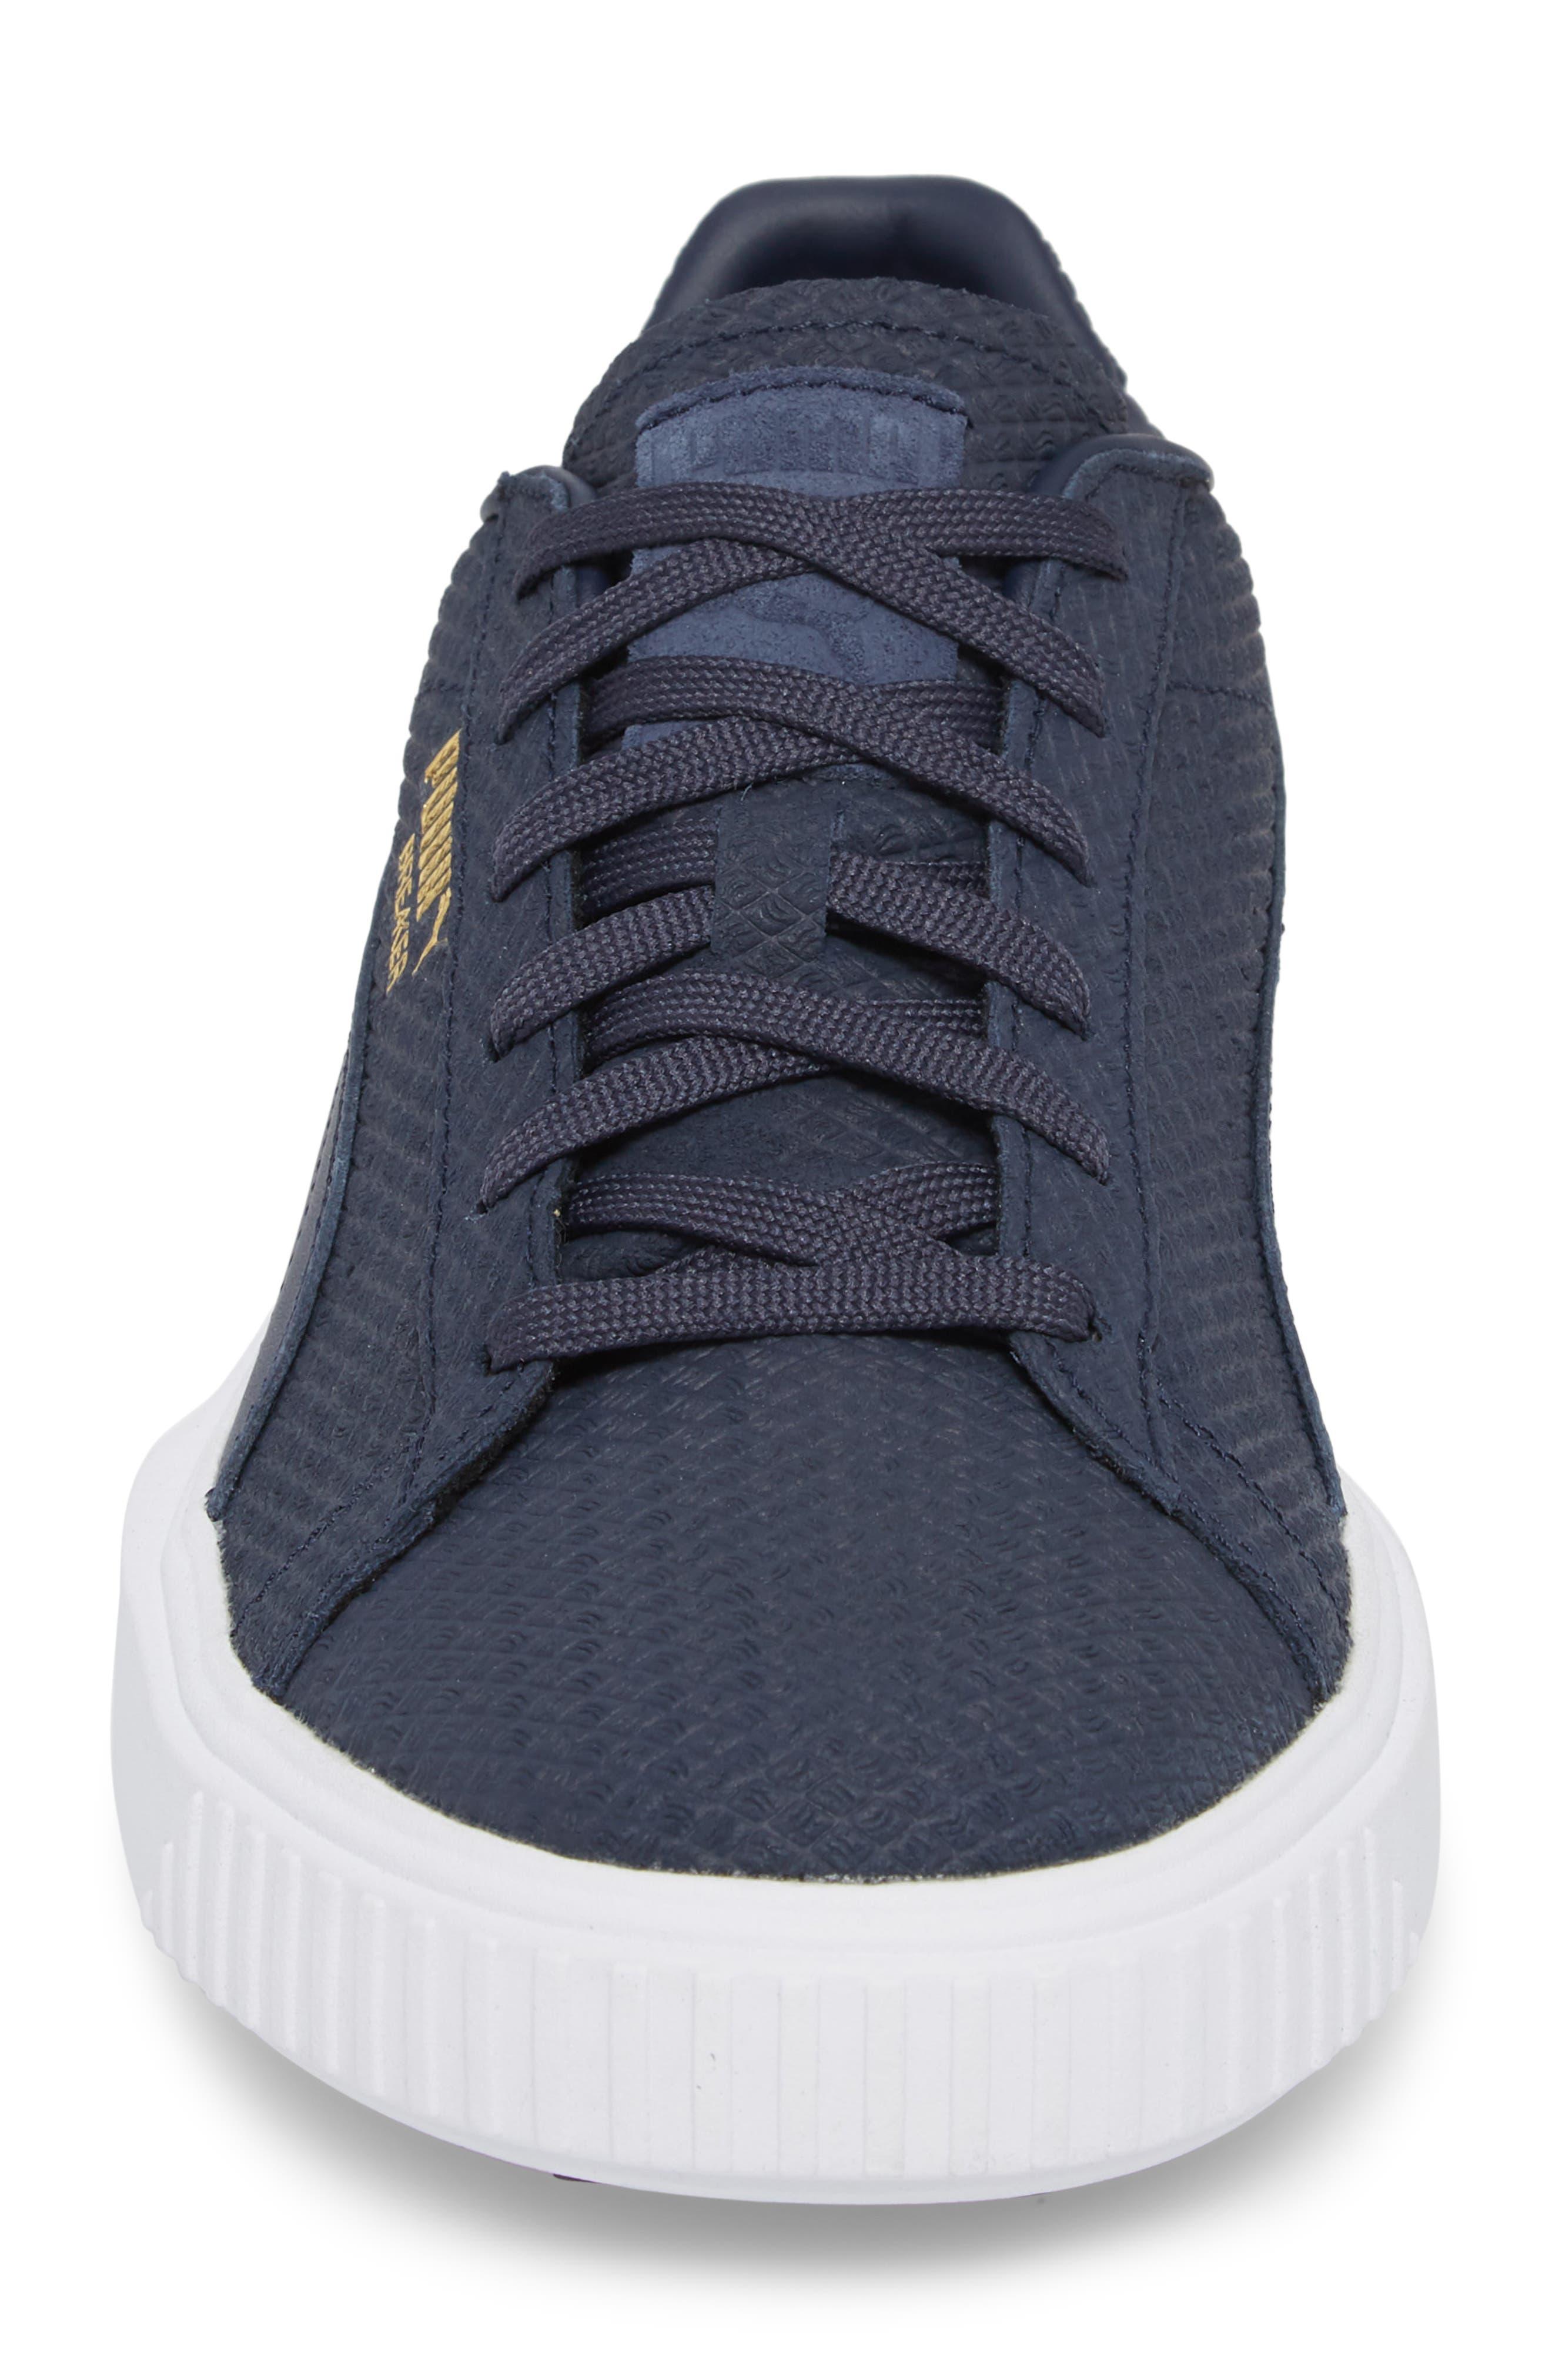 Breaker Suede Sneaker,                             Alternate thumbnail 4, color,                             400